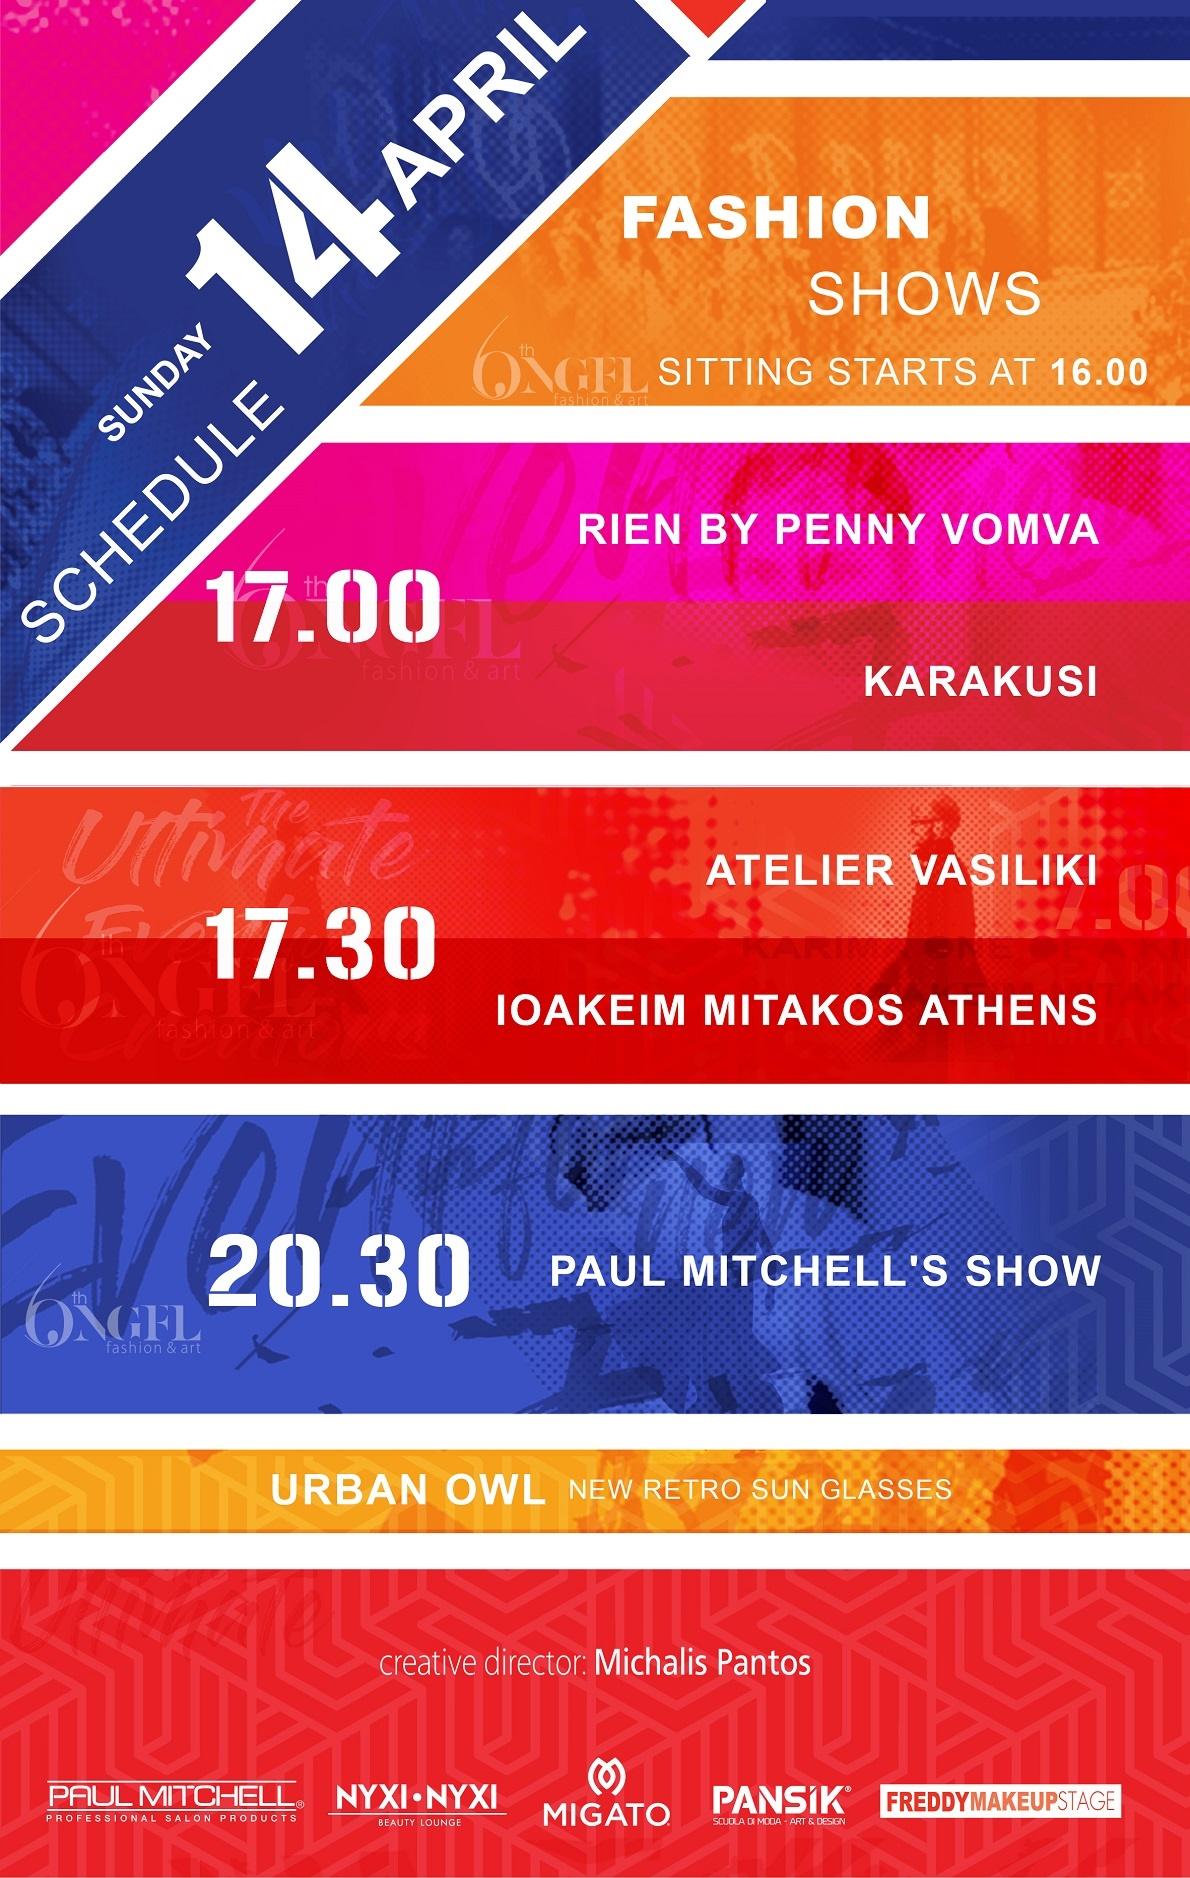 NGFL6 fashion show schedule at Athinais Venue Greece